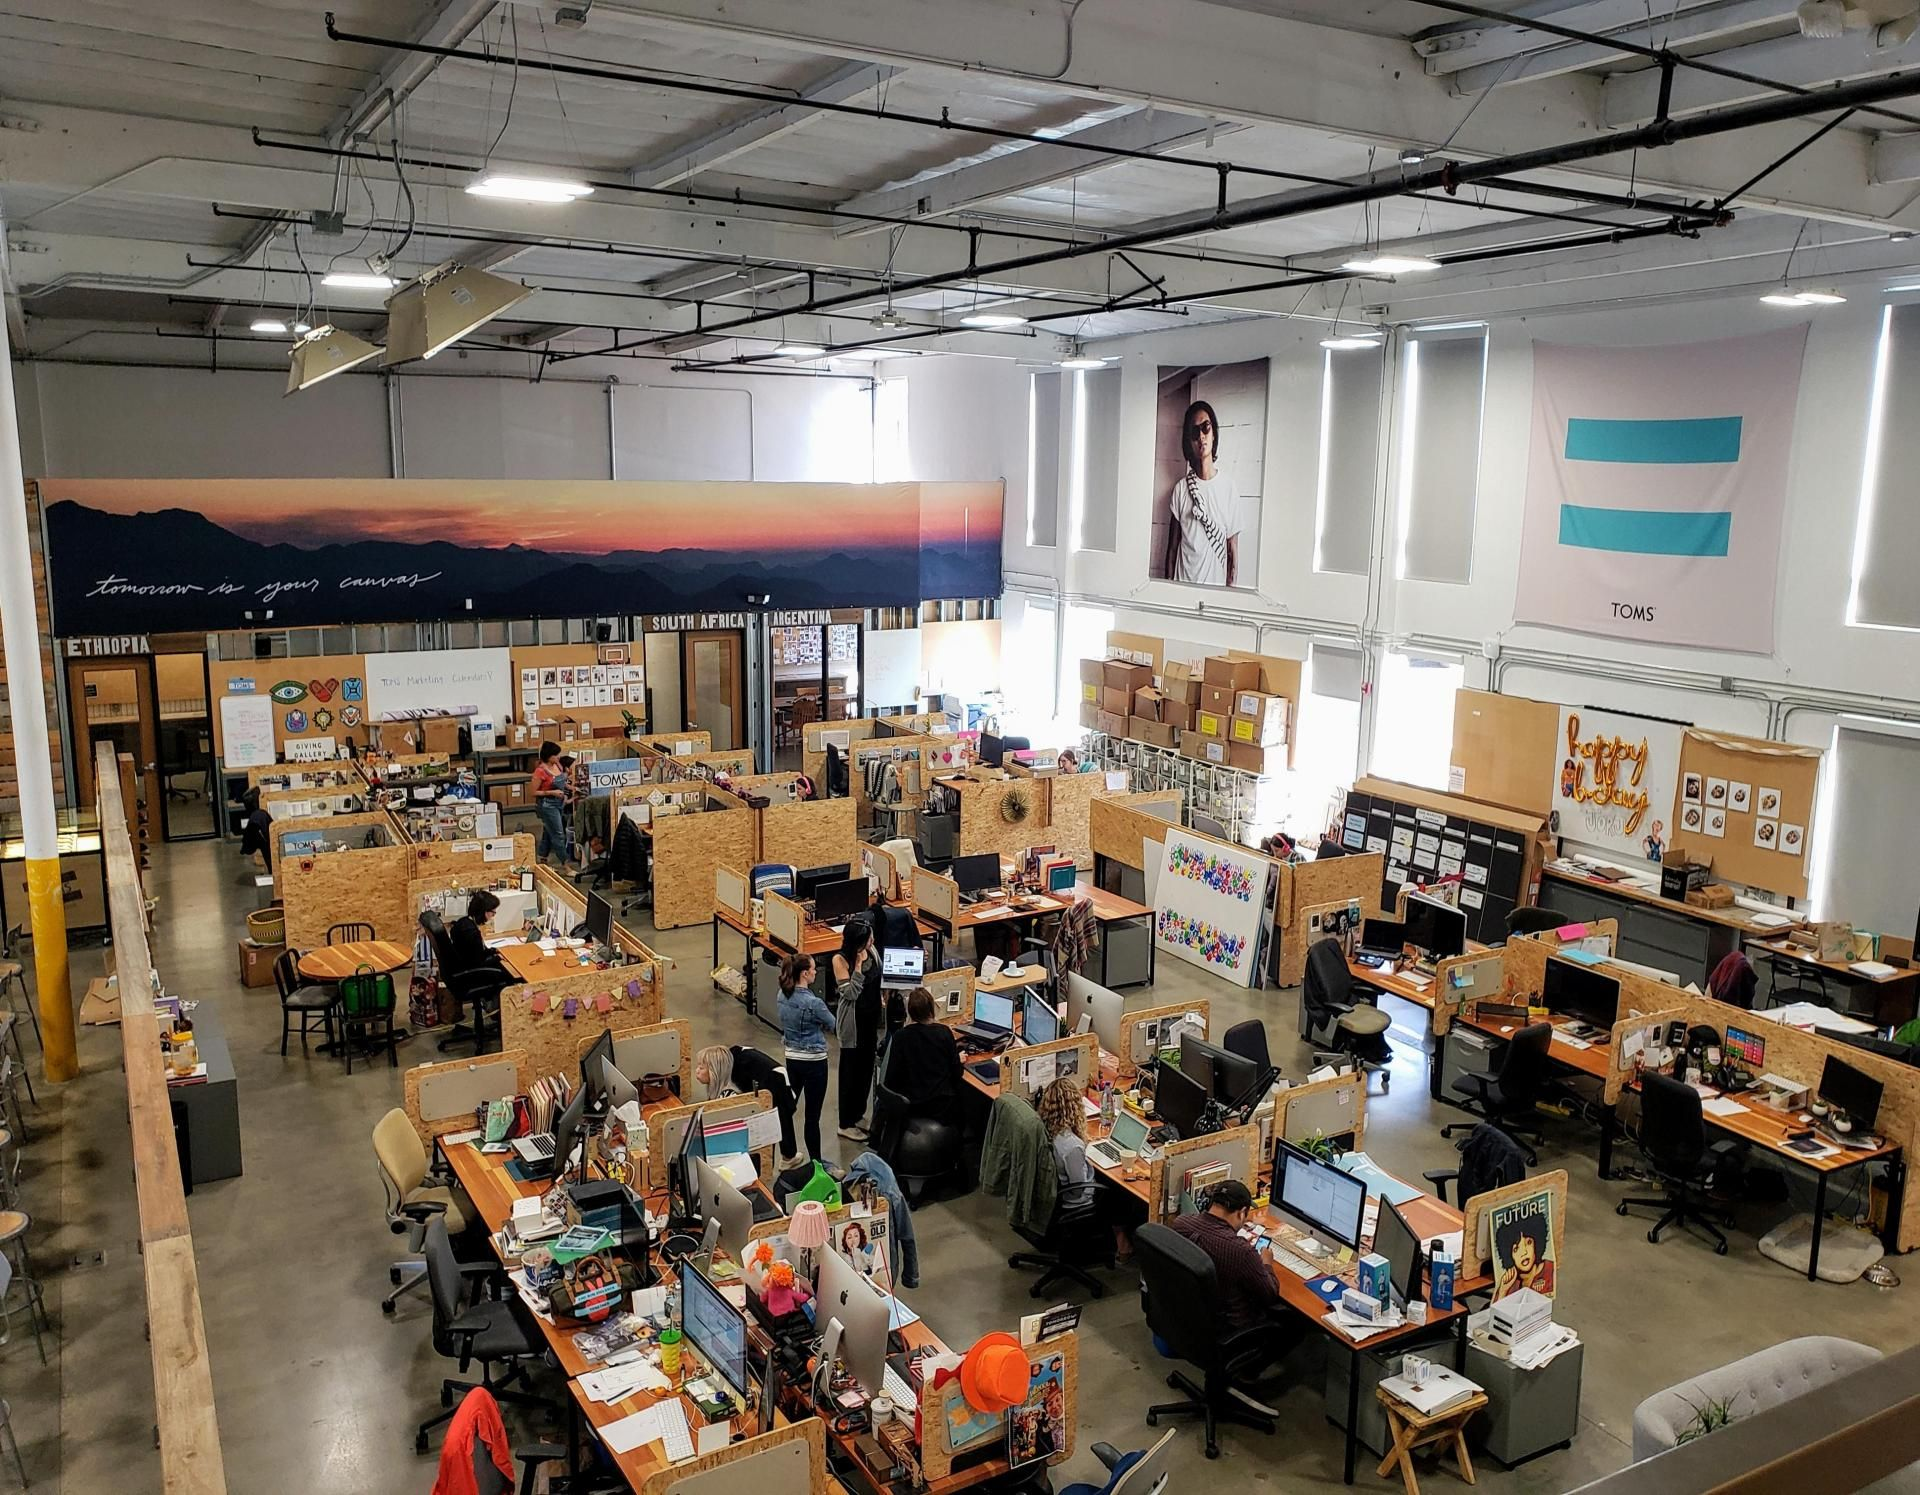 TOMS' headquarters in Playa Vista